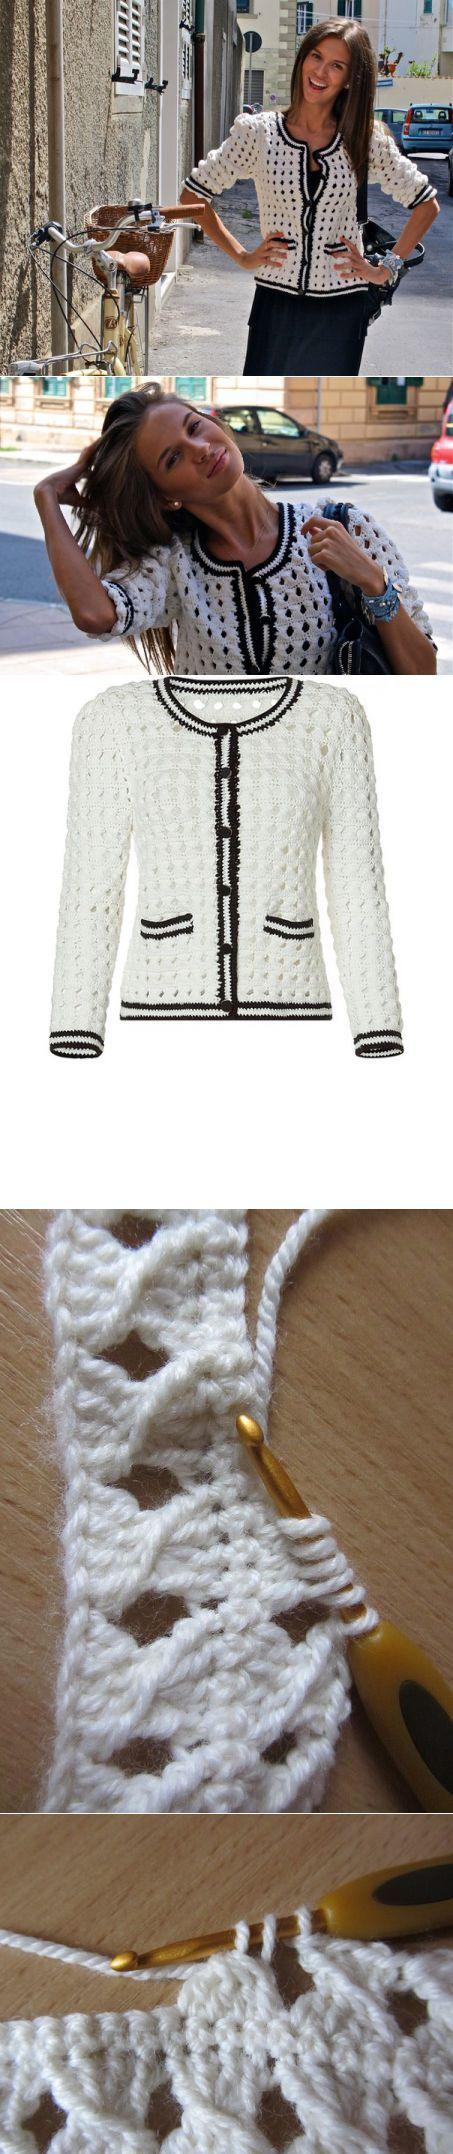 Chanel tarzı ceket | вязание крючком | Постила